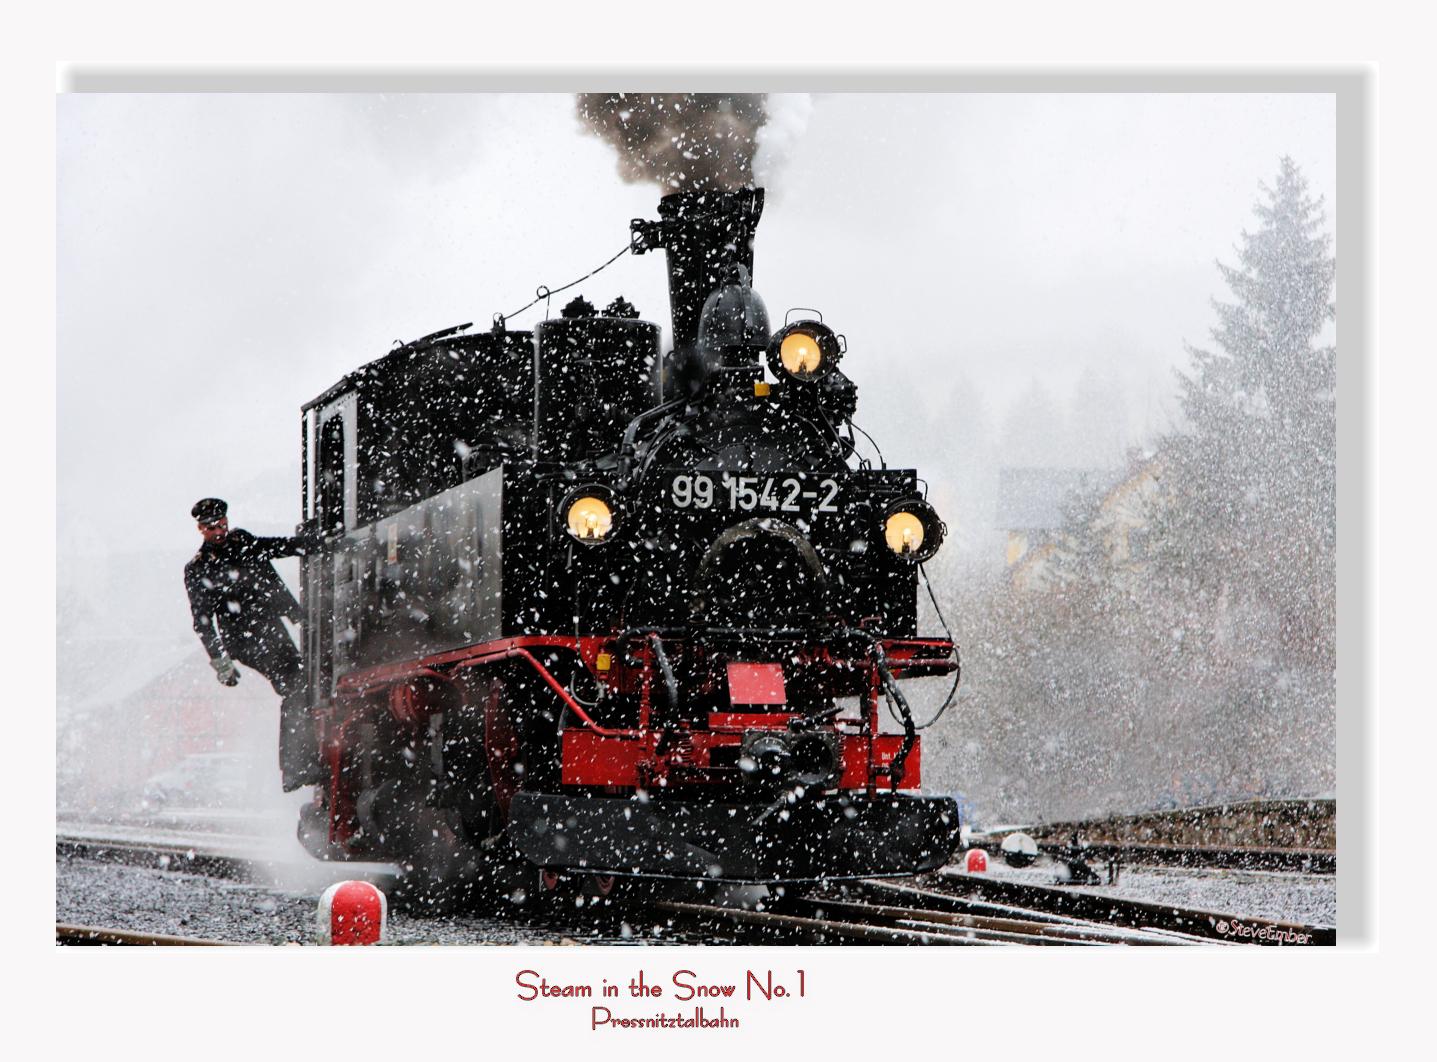 Steam in the Snow, Pressnitztalbahn No.1